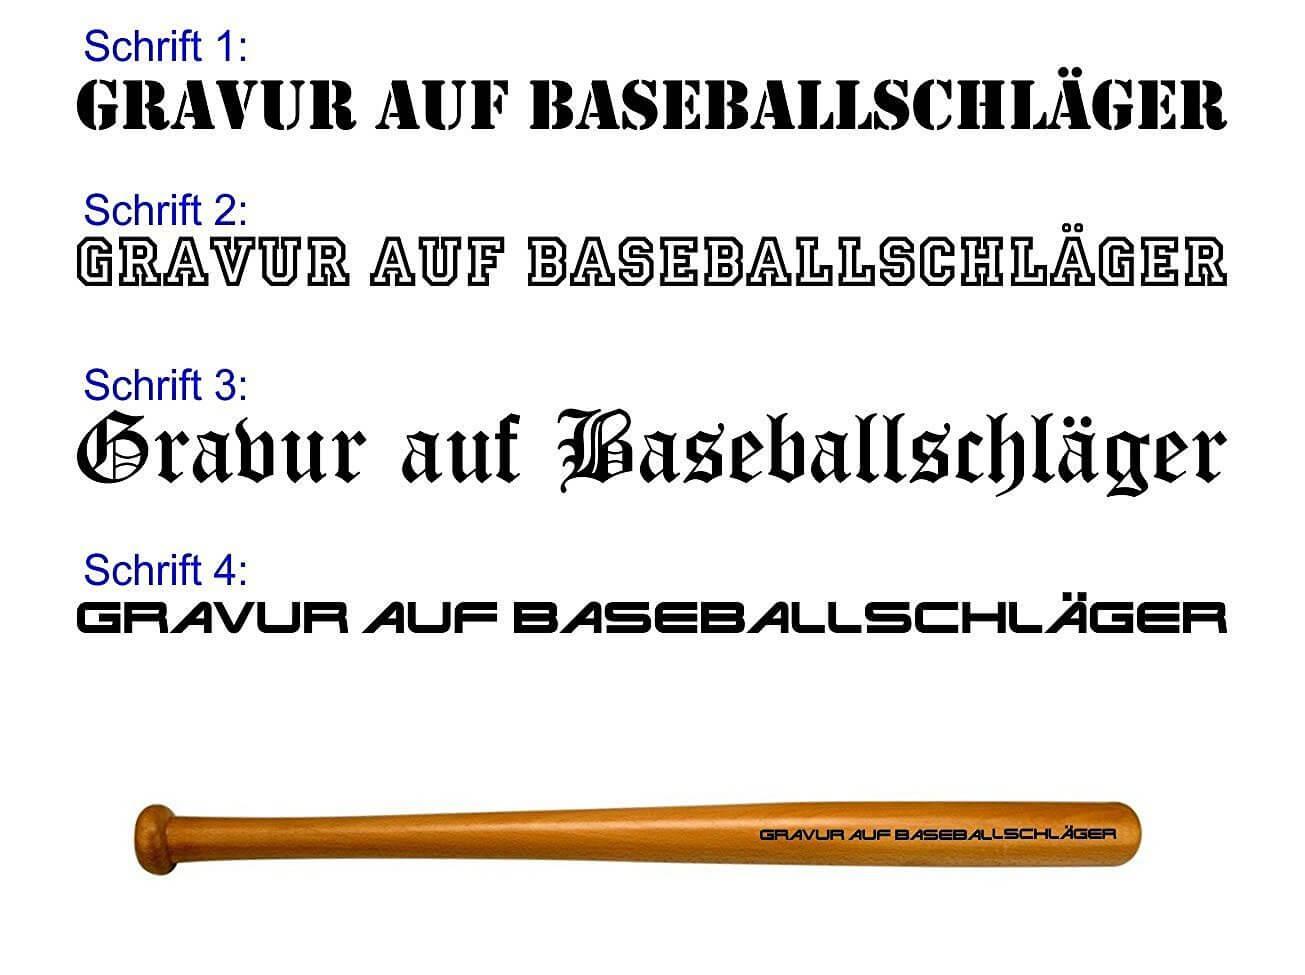 Schriften-Auswahl-Baseballschla-ger-gravur